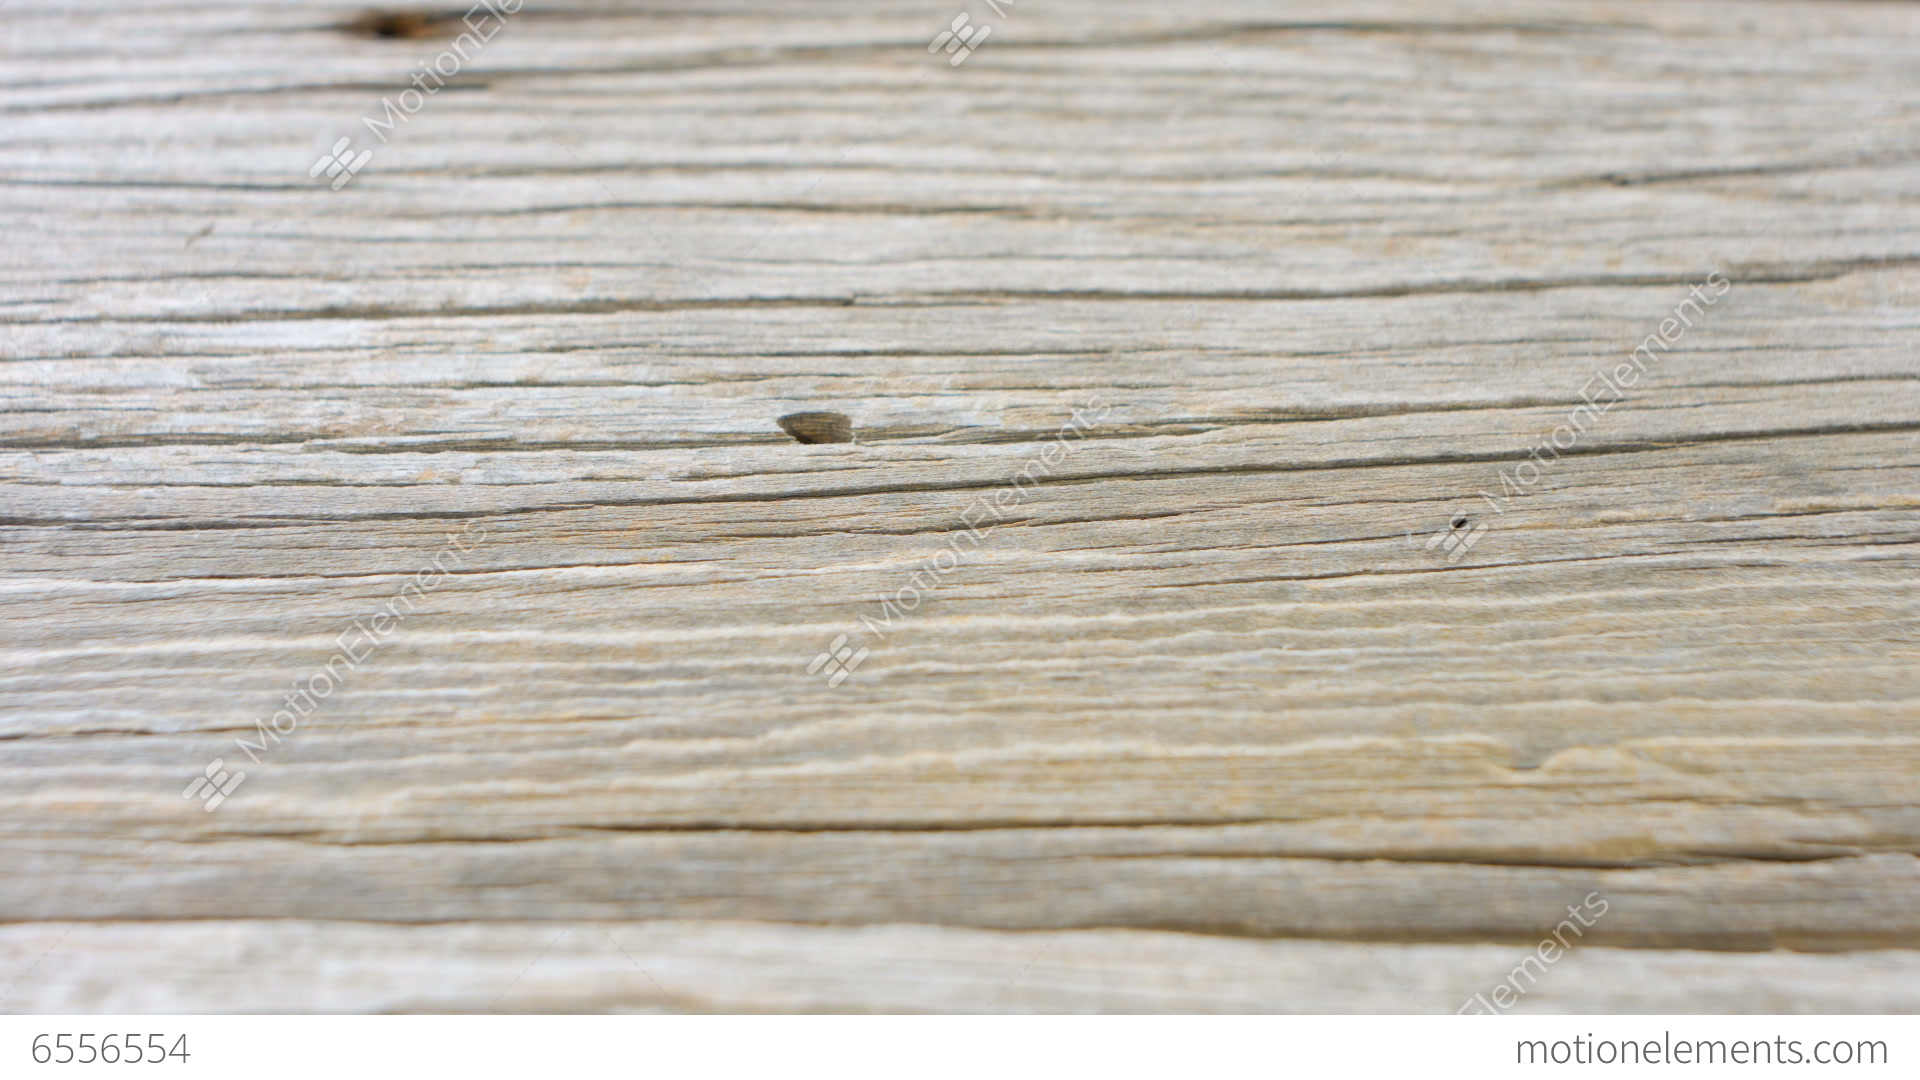 Vintage wood texture backgrounds 6556554 vintage wood texture backgrounds voltagebd Choice Image